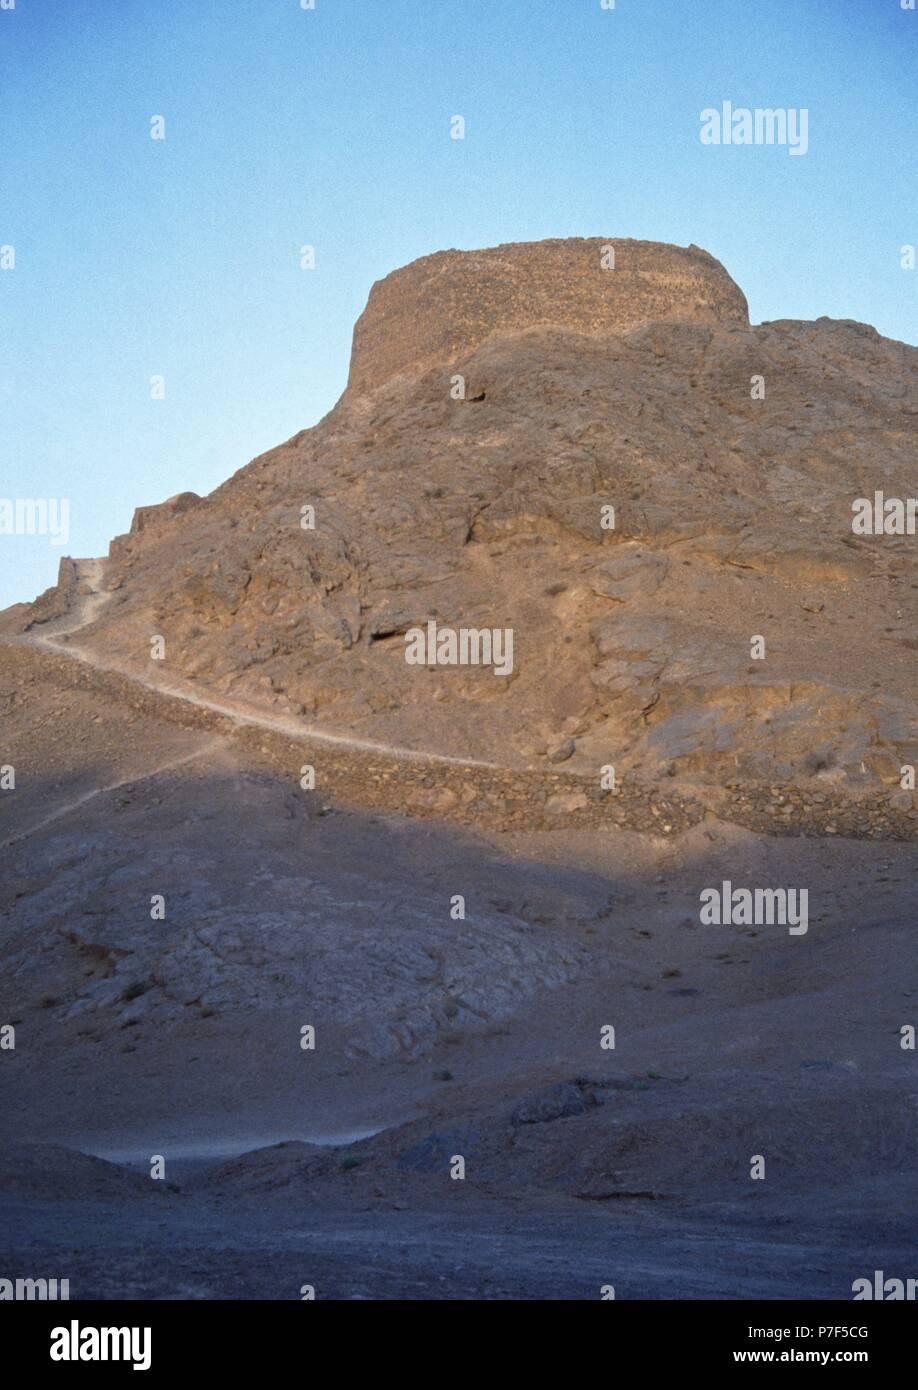 Iran. Yazd. Zoroastrian Tower of Silence. - Stock Image